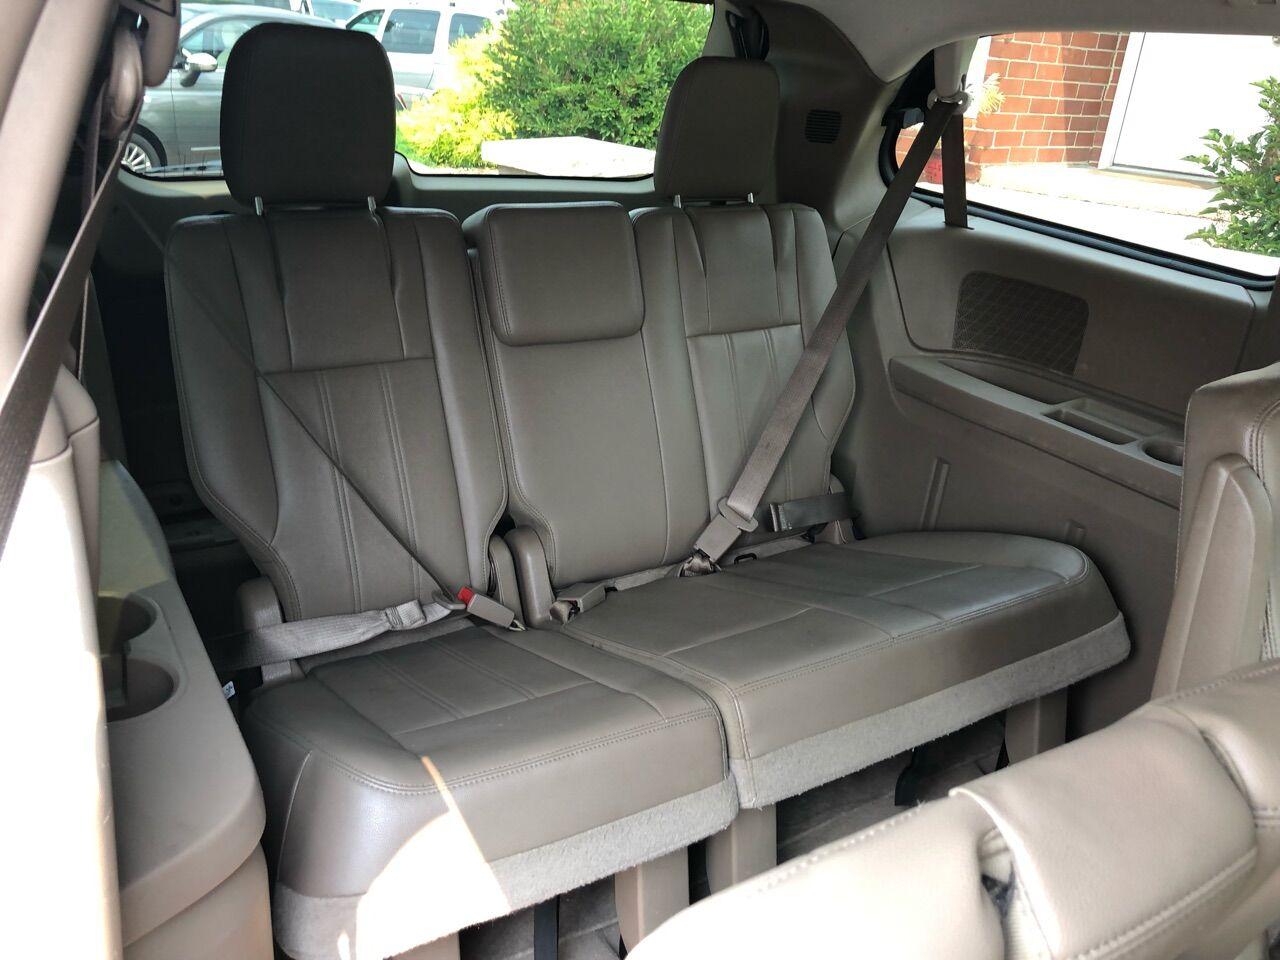 2014 Chrysler Town and Country Mini-van, Passenger